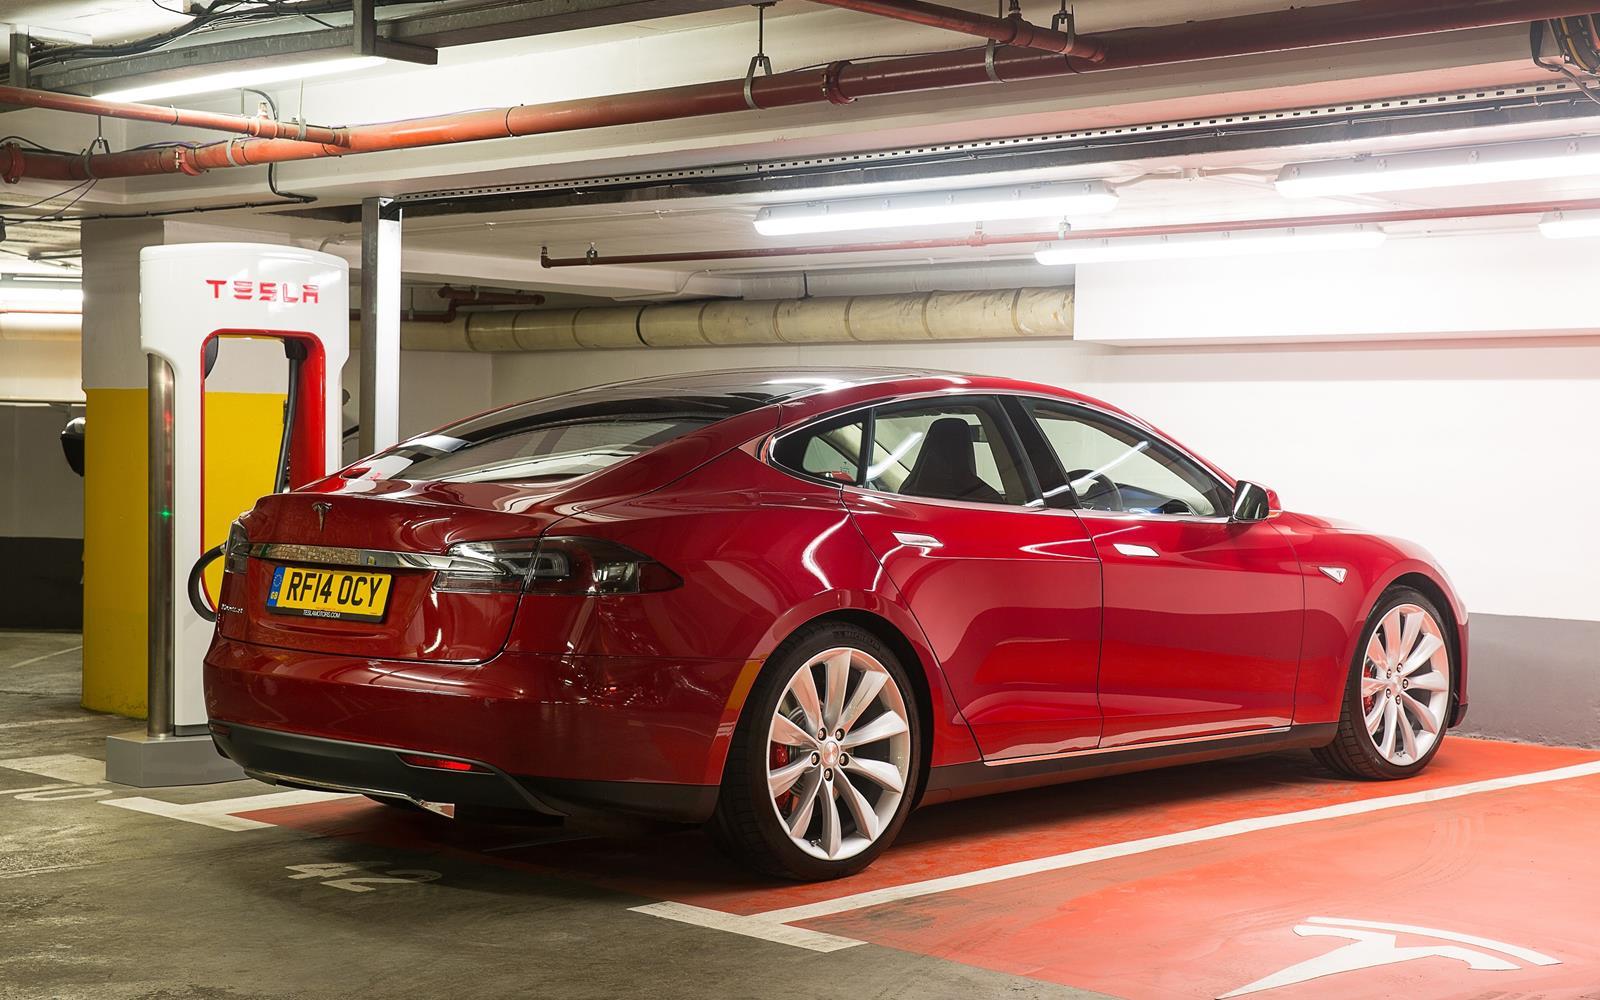 Tesla Model S 2015 Rear at Supercharger